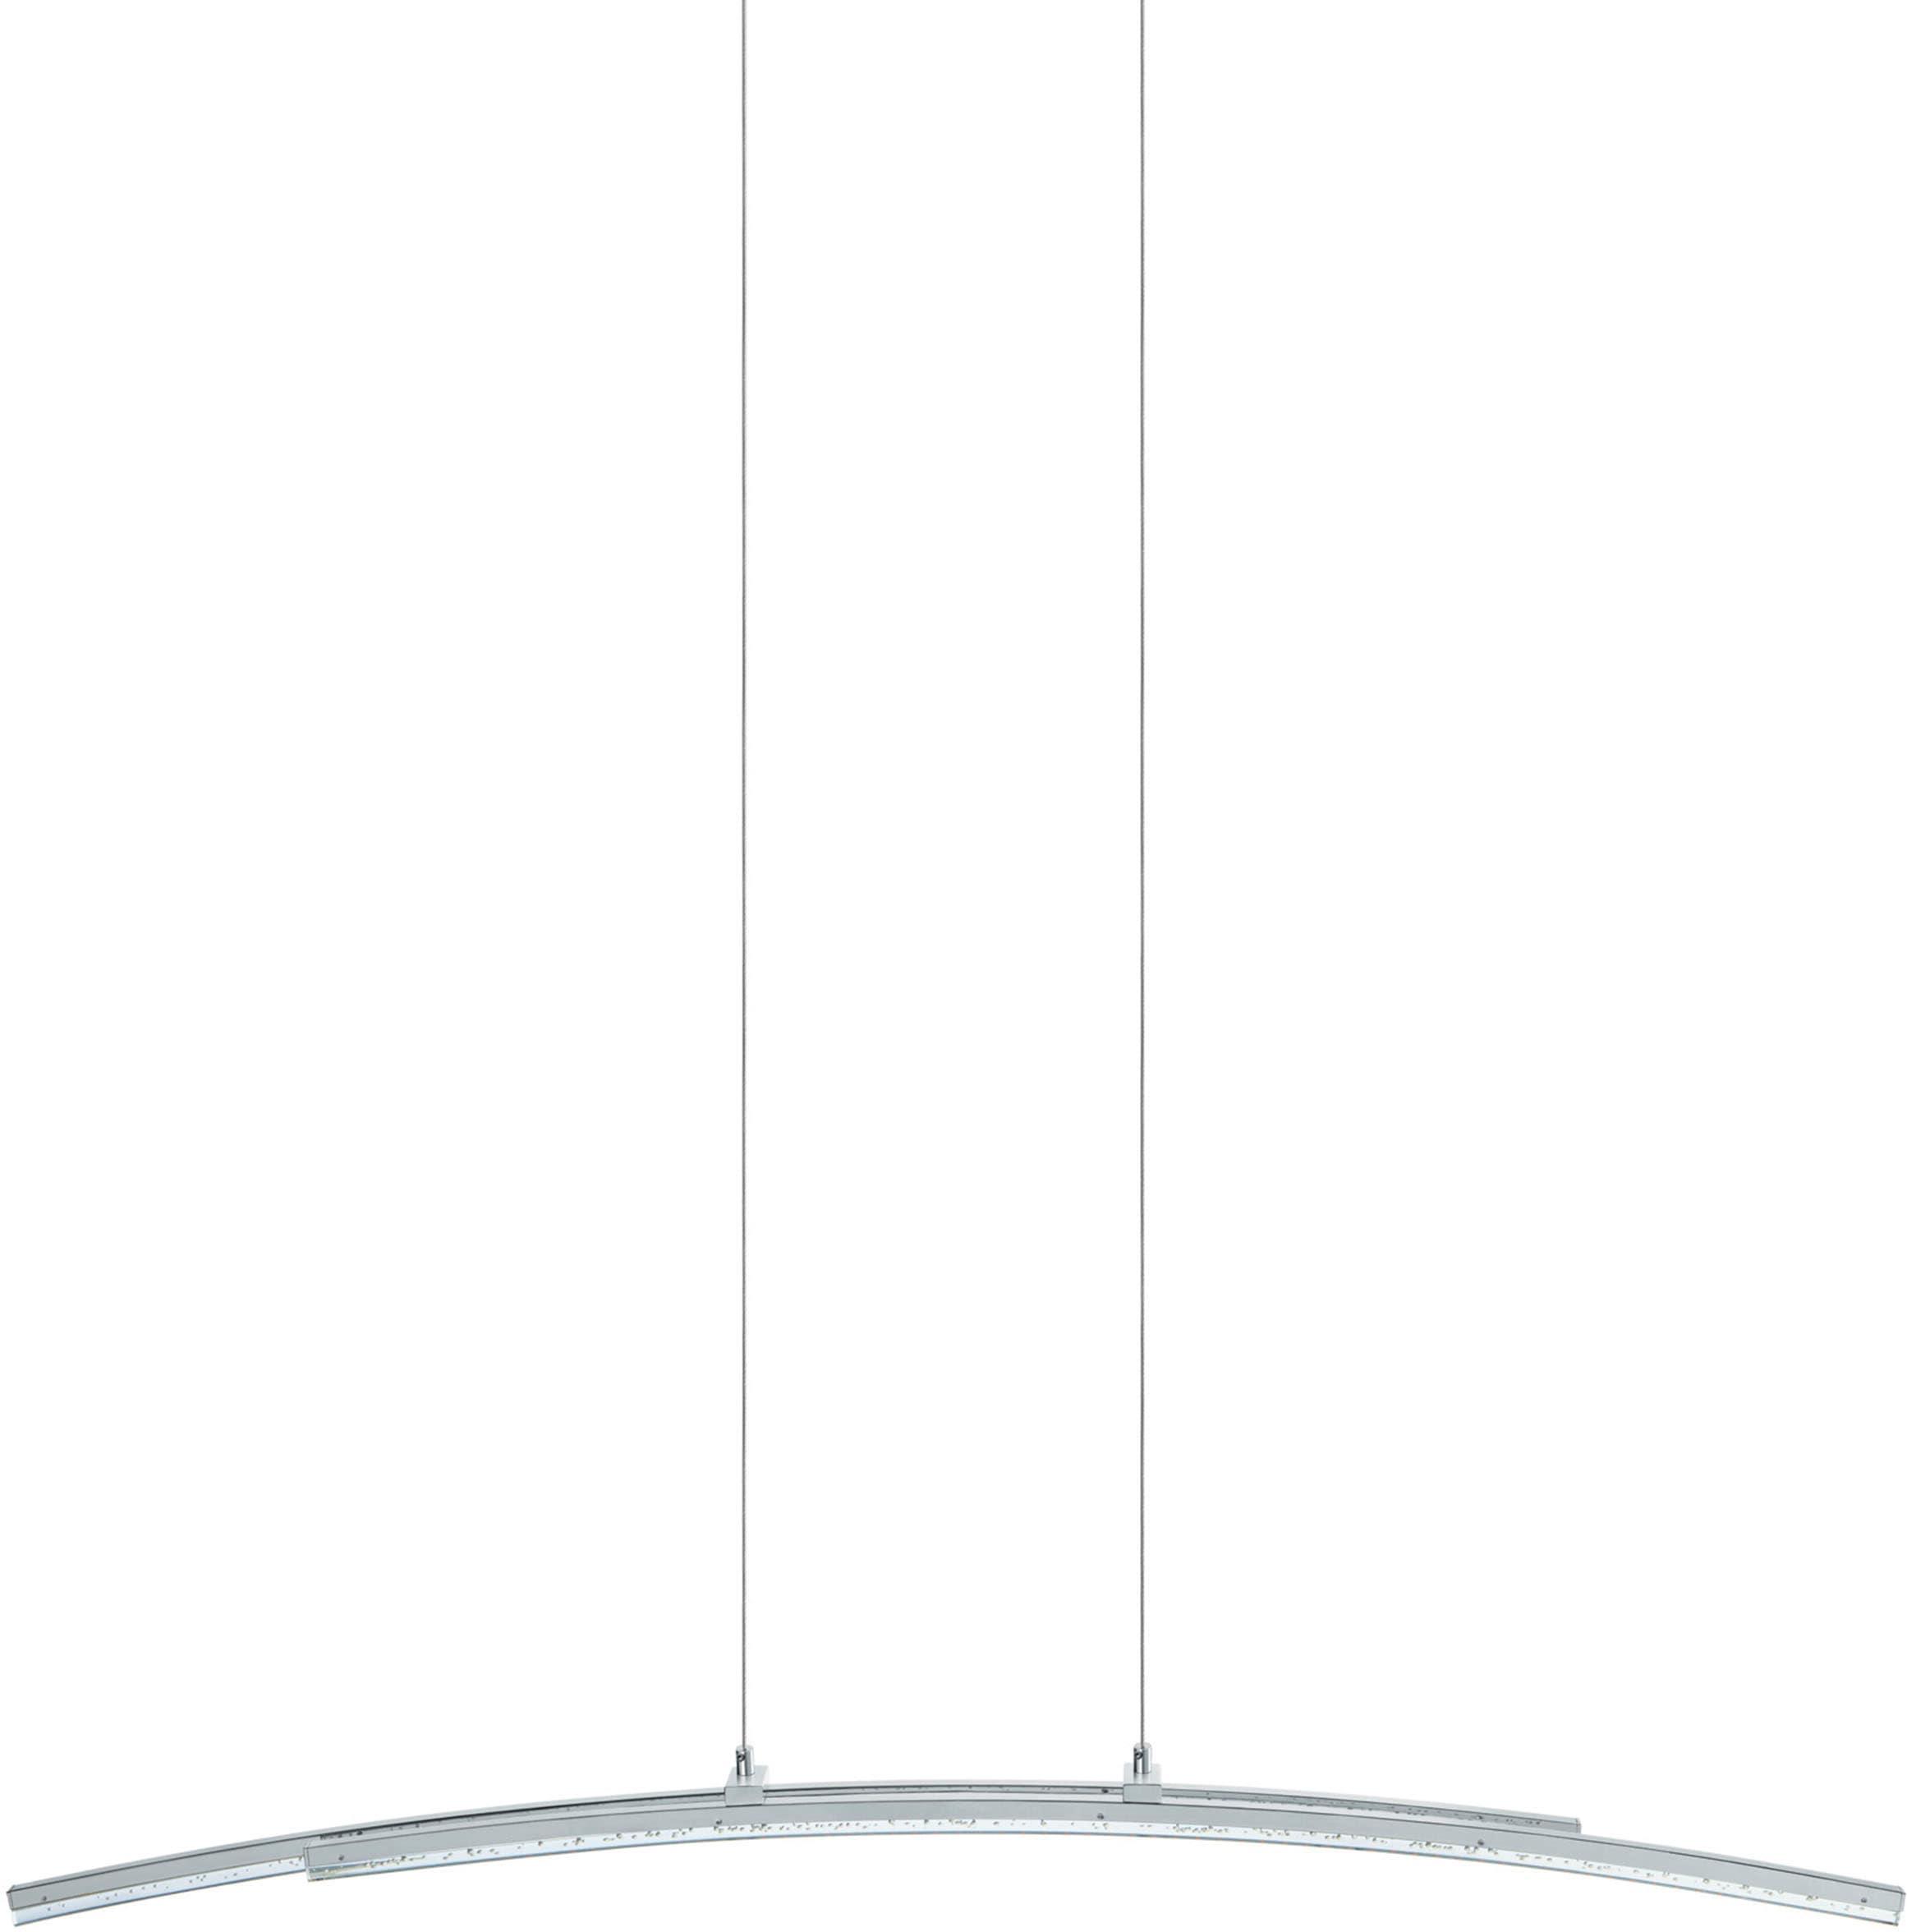 EGLO Hängeleuchte PERTINI, LED-Board, Warmweiß, Pendelleuchte, Pendellampe